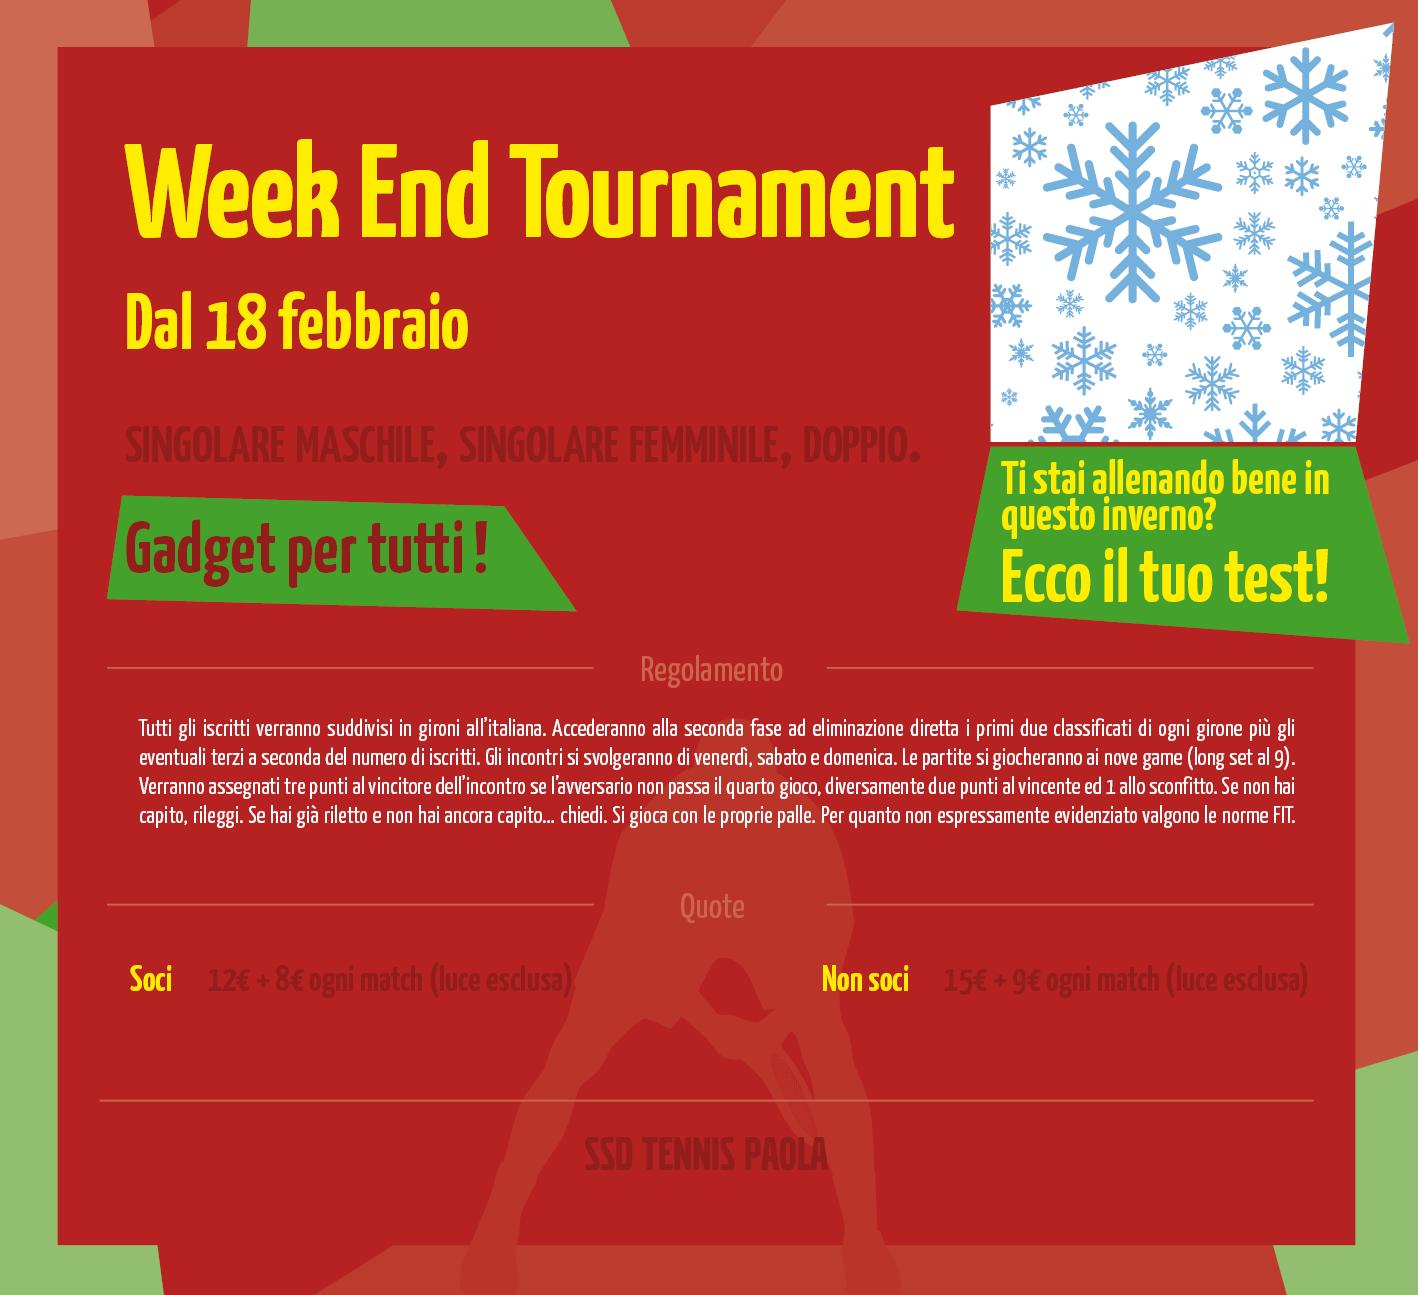 Week End Tournament 2017